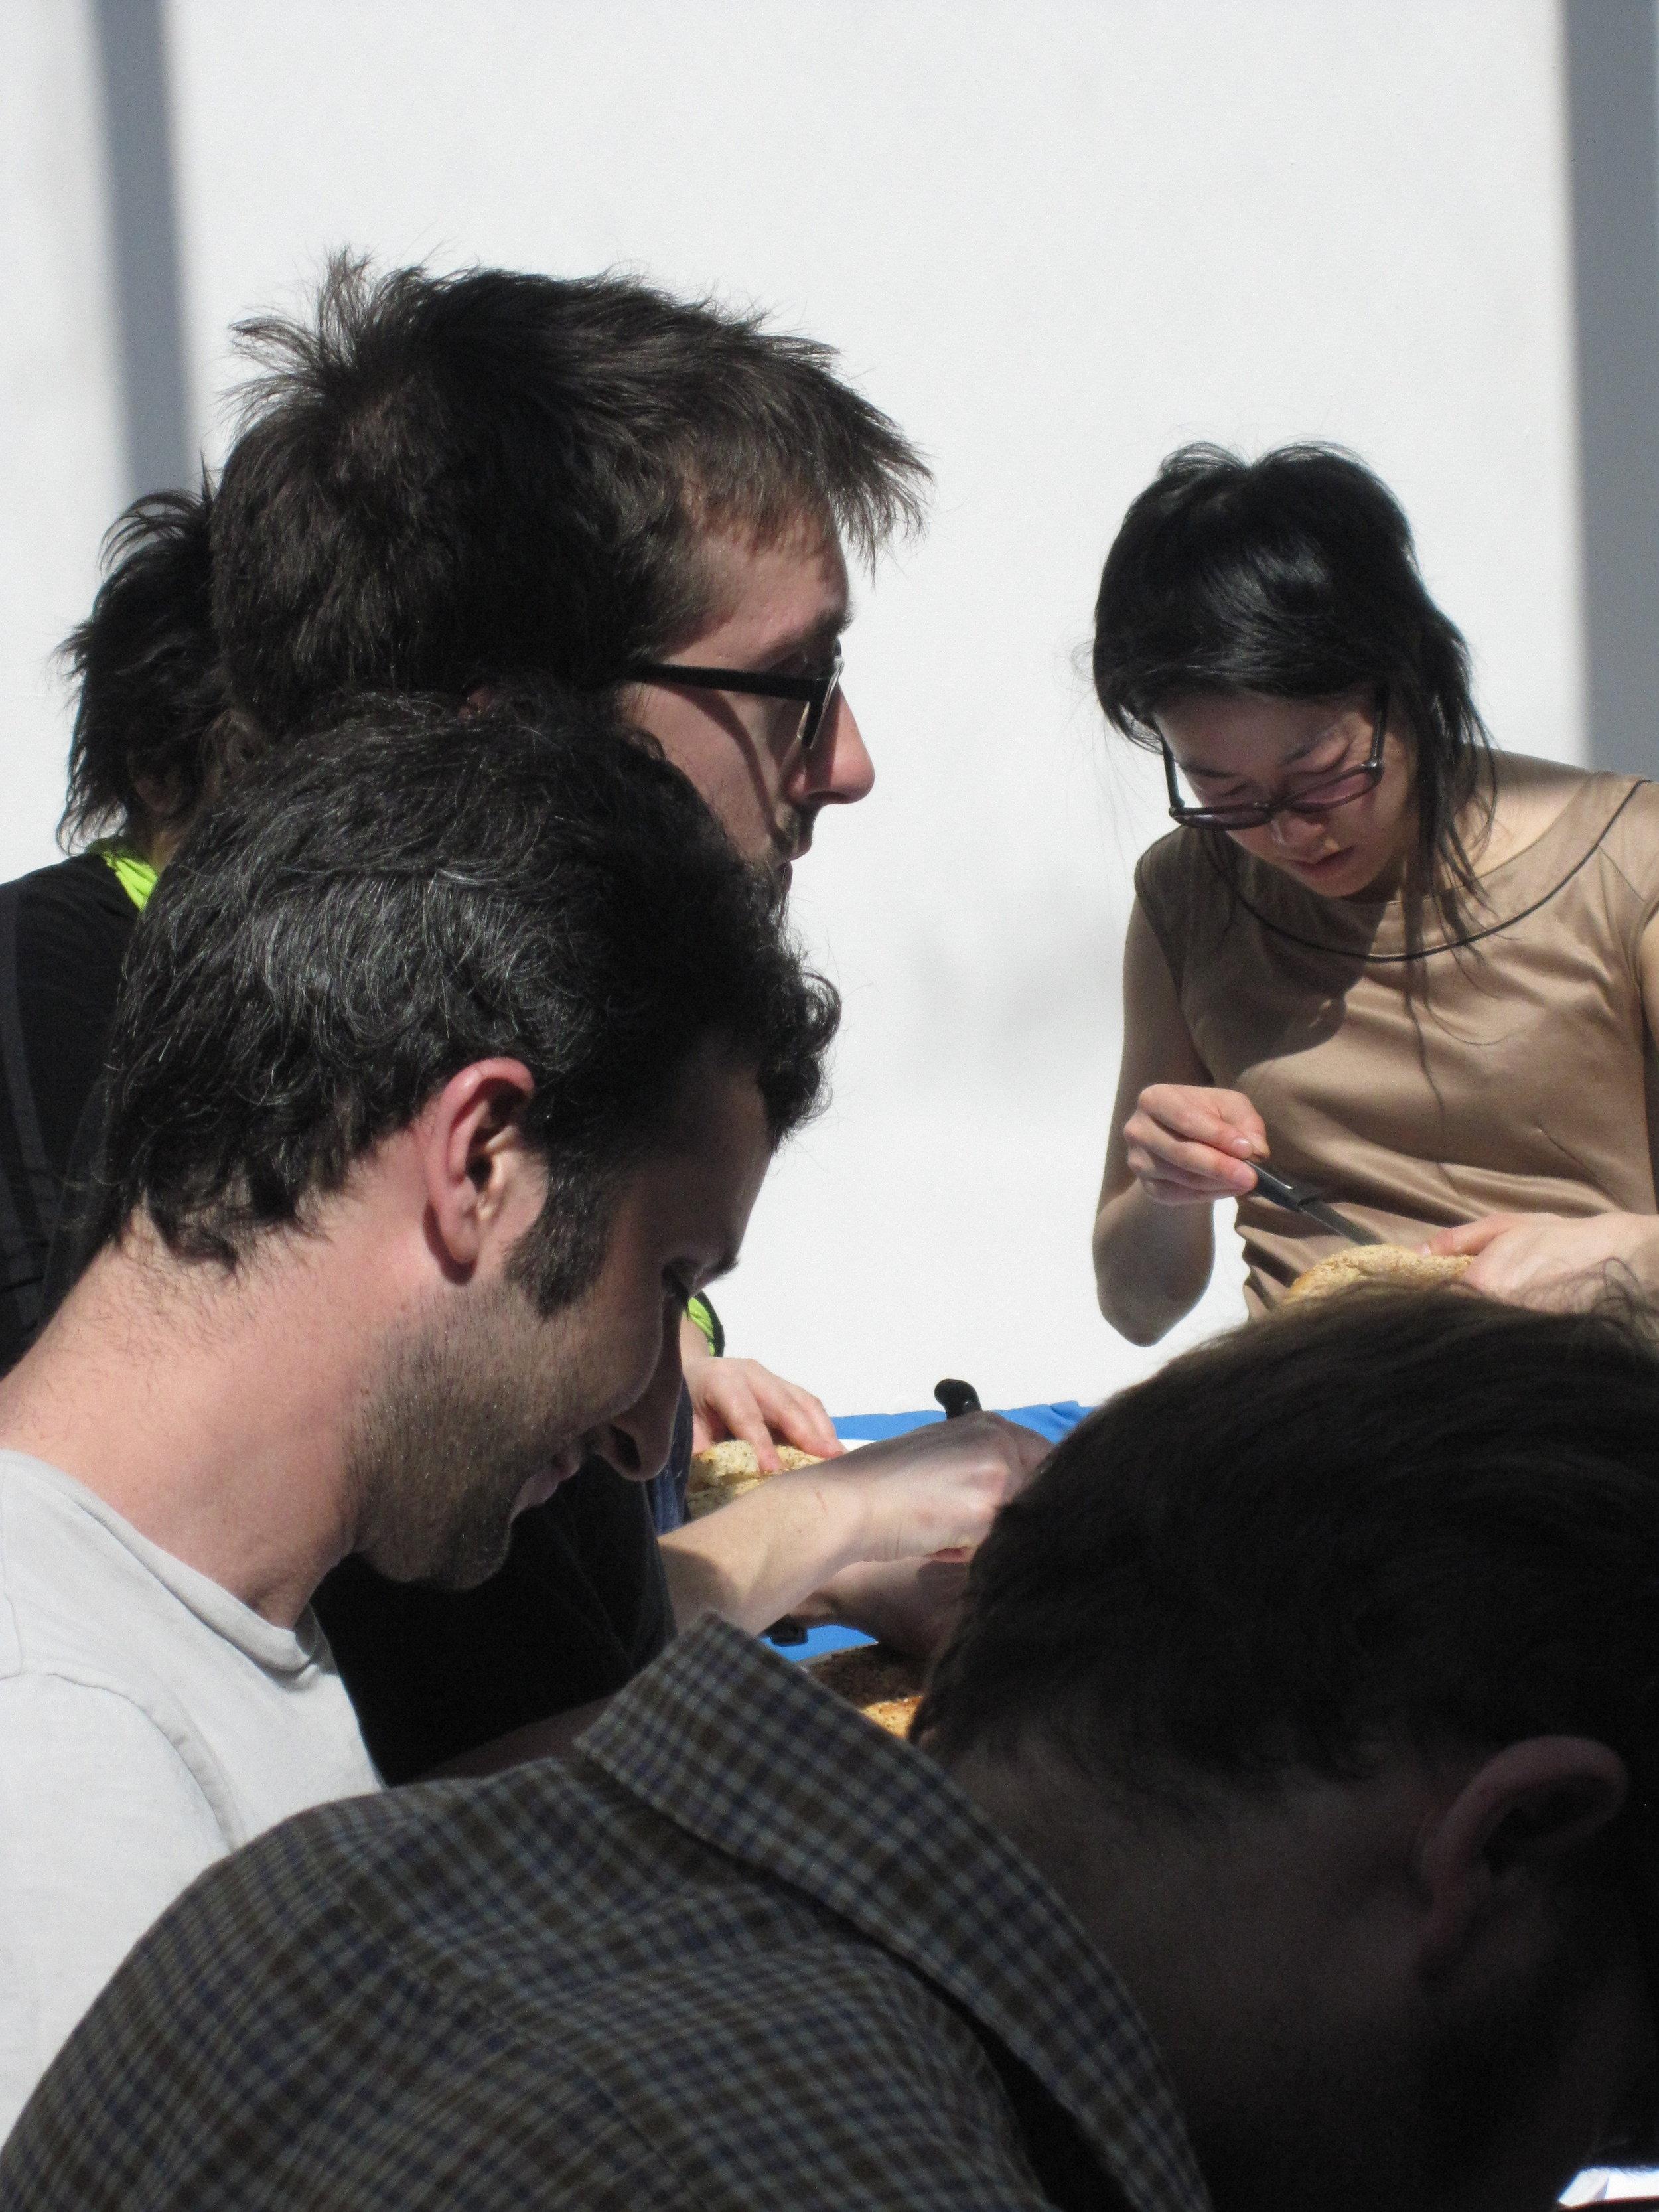 symposium-doing-3_4493384729_o.jpg